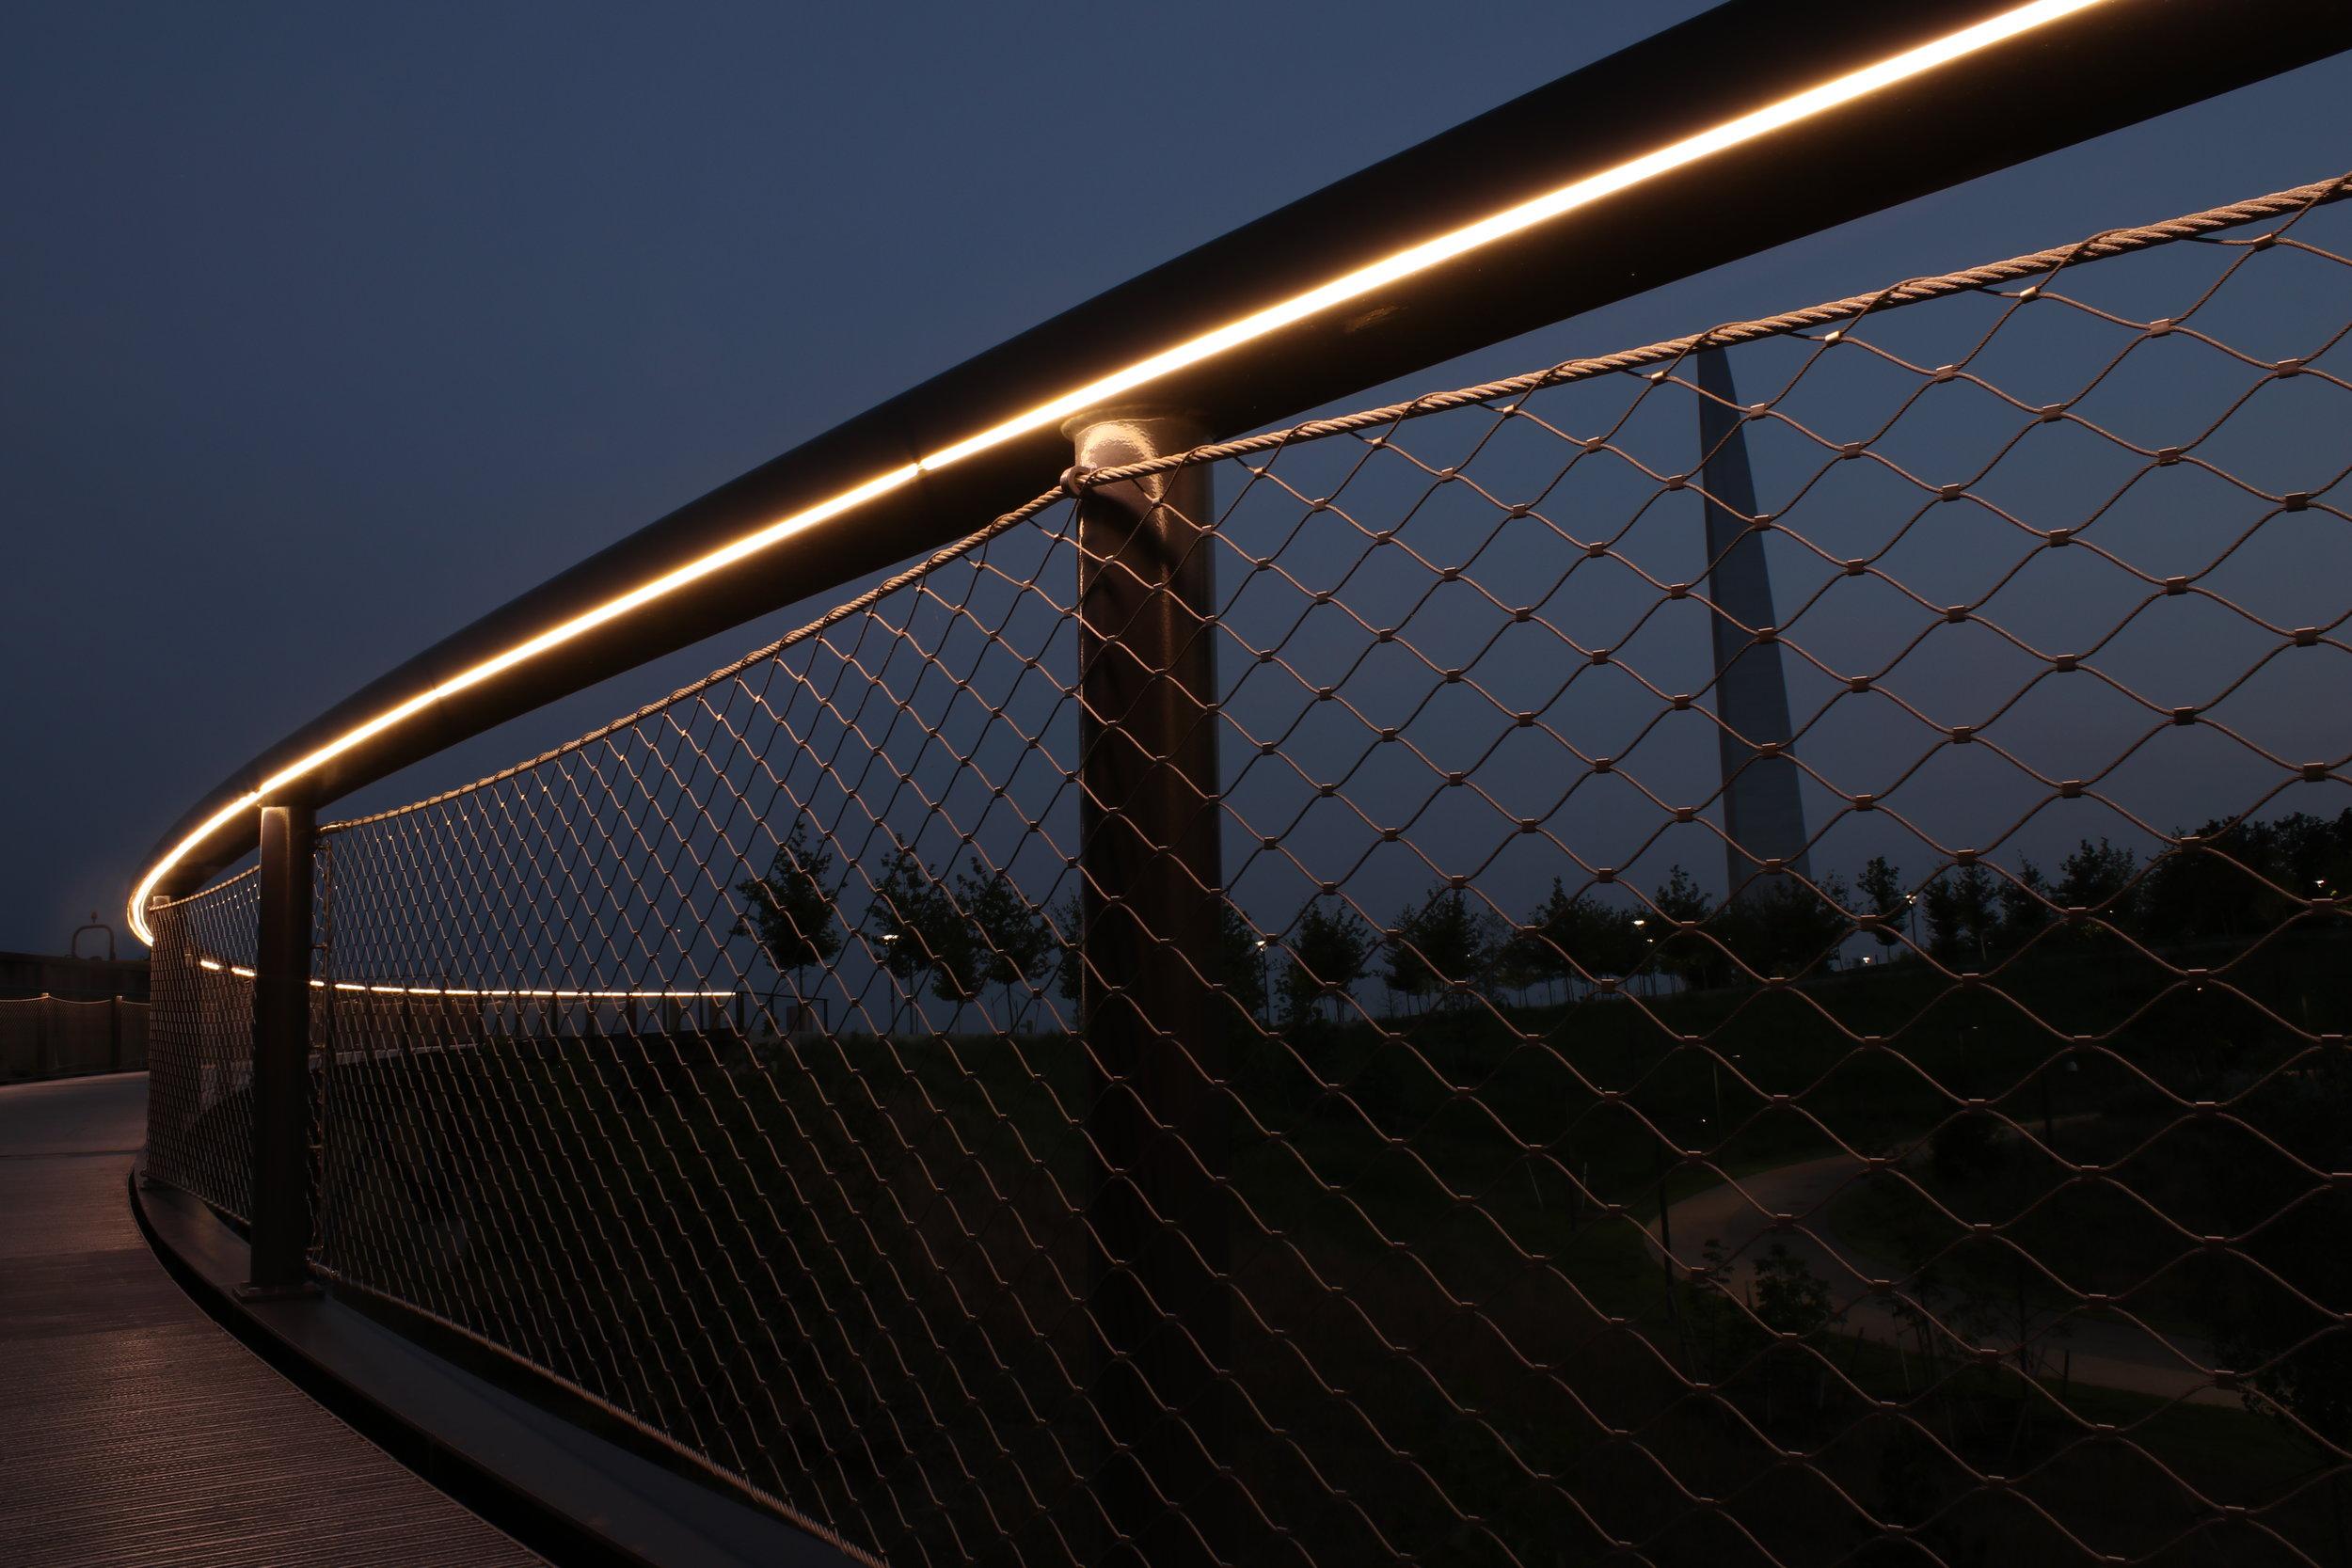 iLight-2-St-Louis-Gateway-Arch-Park-Riverfront-LED-handrail-lighting-10.jpg